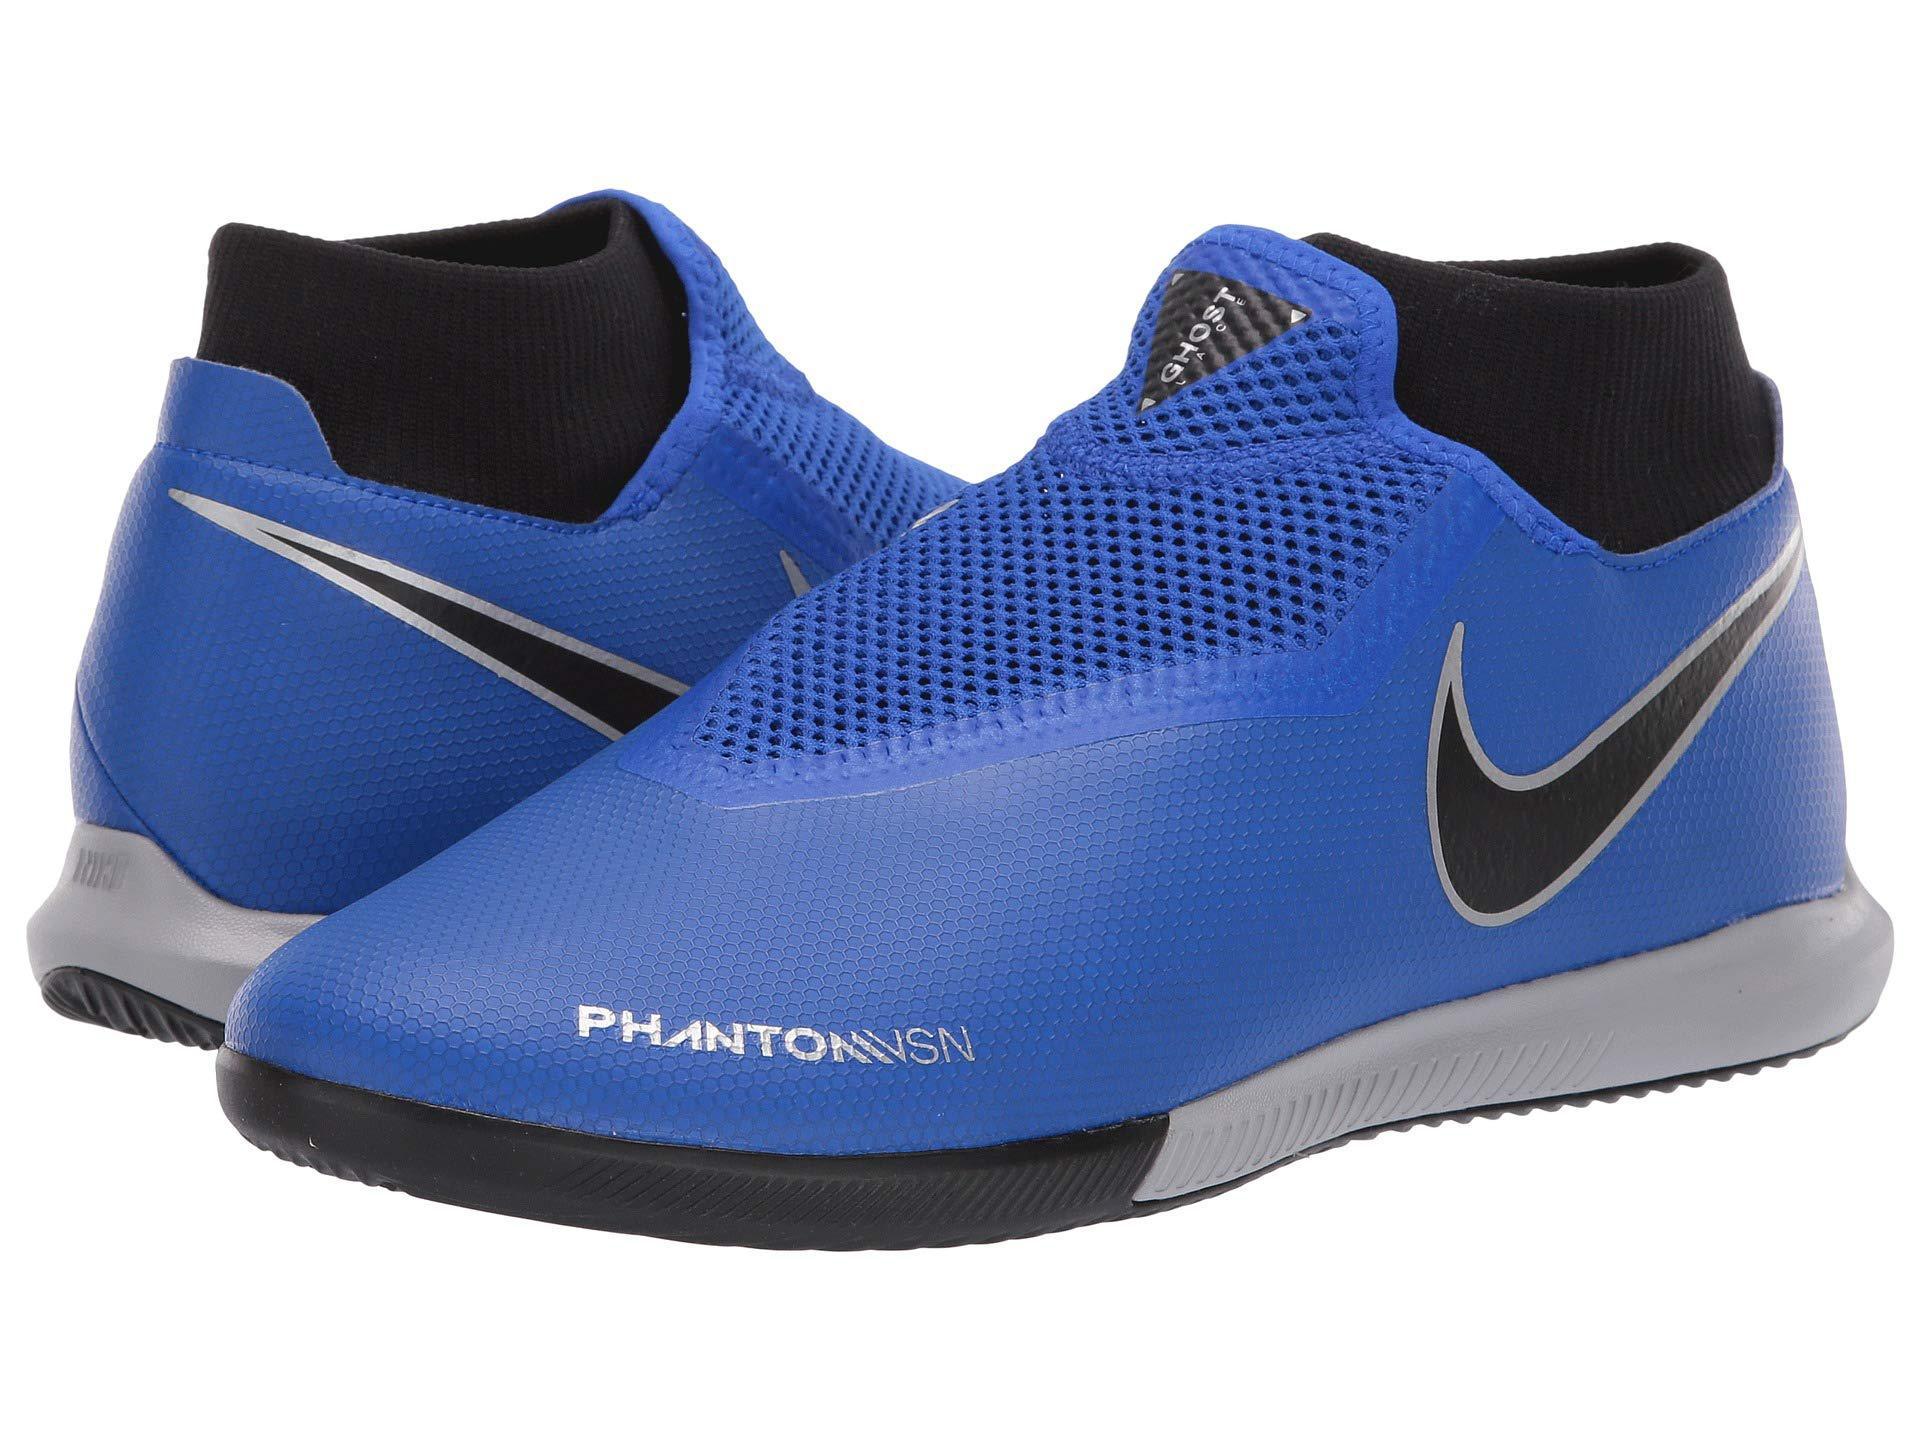 778369b8534cf nike -Racer-BlueRacer-BlueBlack-Phantom-Vsn-Academy-Df-Ic-blackmetallic-Silverracer-Blue-Mens-Soccer-Shoes.jpeg